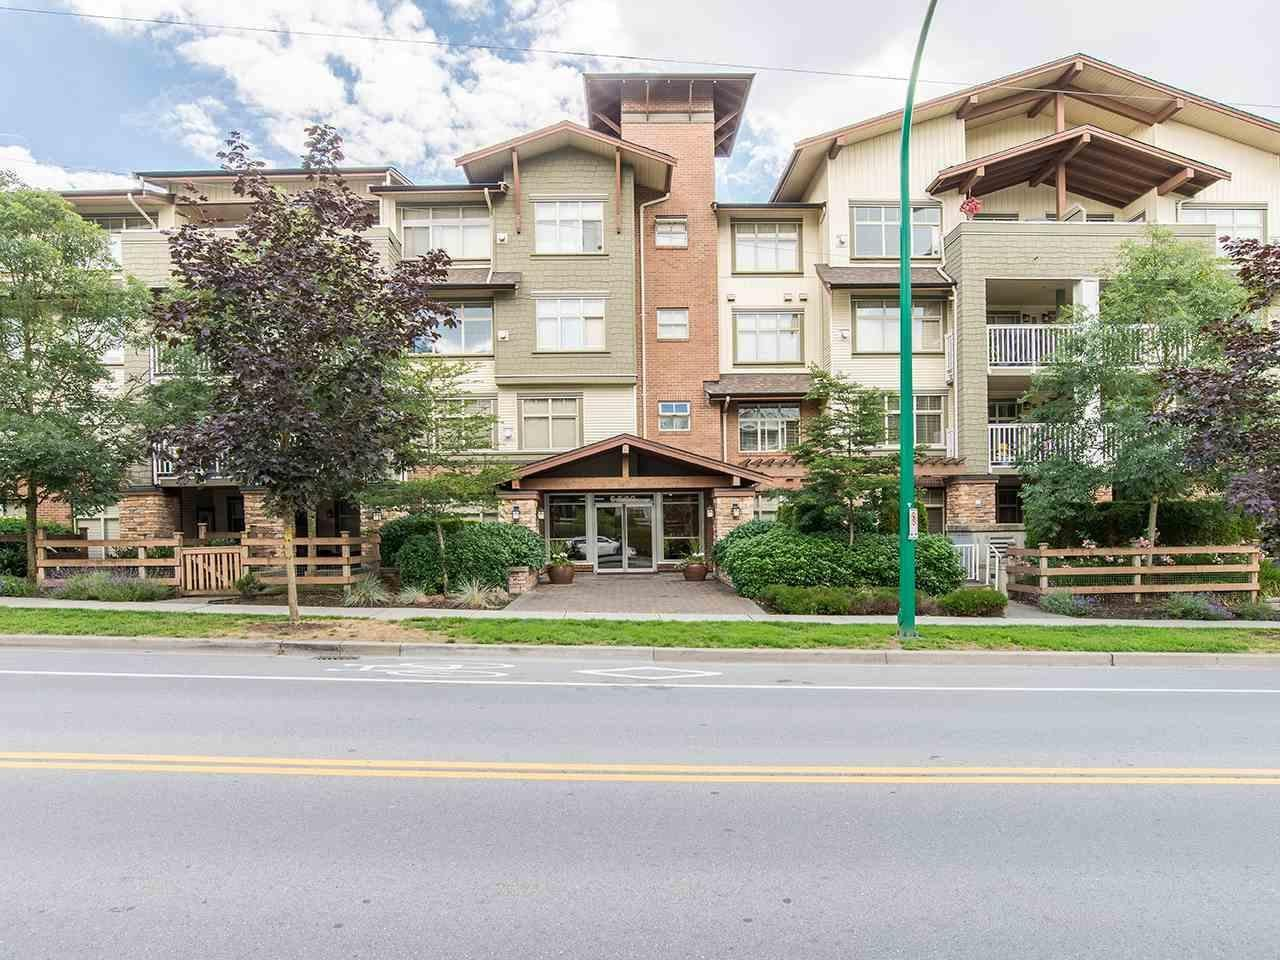 R2137681 - 102 6500 194 STREET, Clayton, Surrey, BC - Apartment Unit